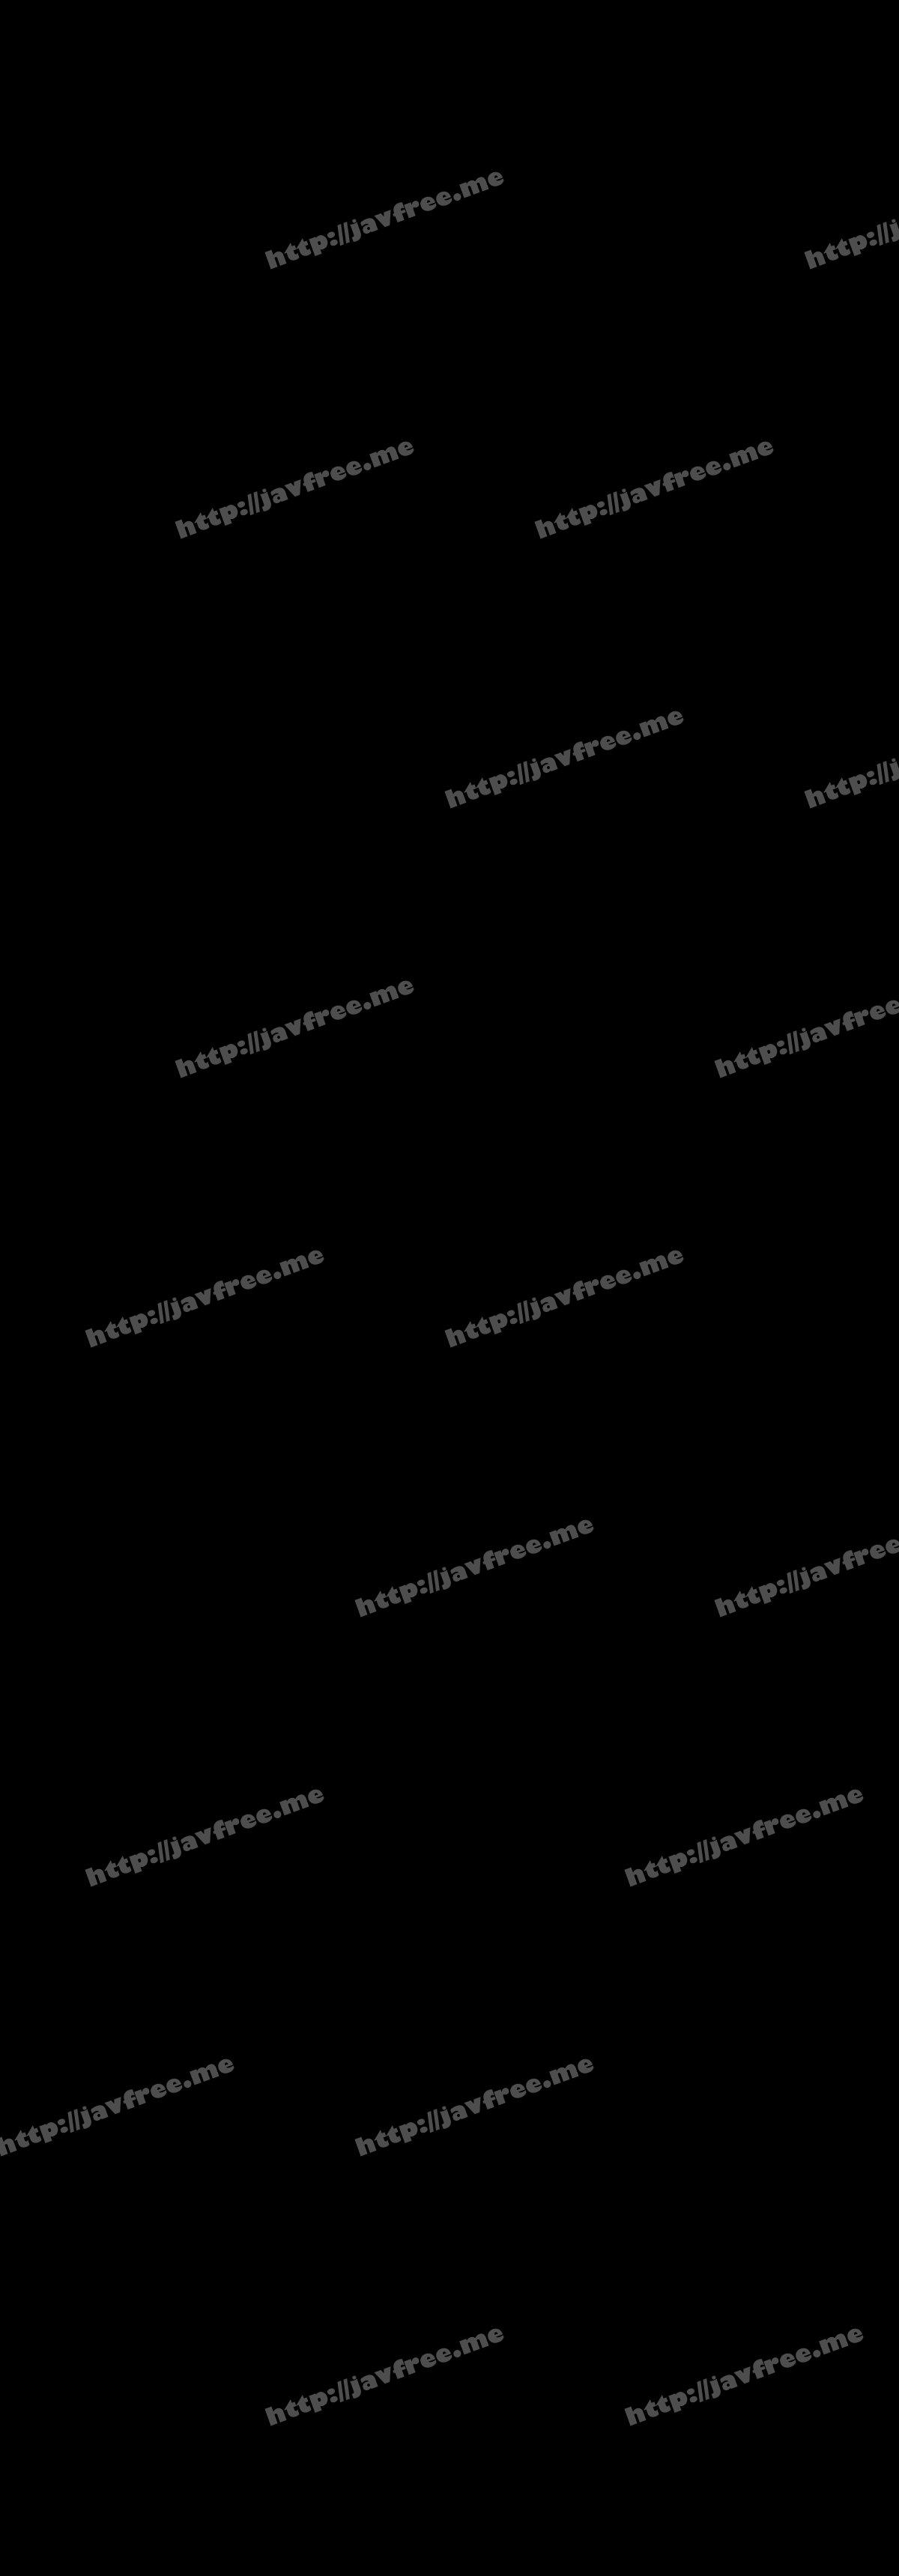 [HD][SSNI-540] 天然立体Hカップ真白真緒 めちゃイキ3本番!おっぱい揺れまくりぷるるんスペシャル - image SSNI-540-1080p on https://javfree.me